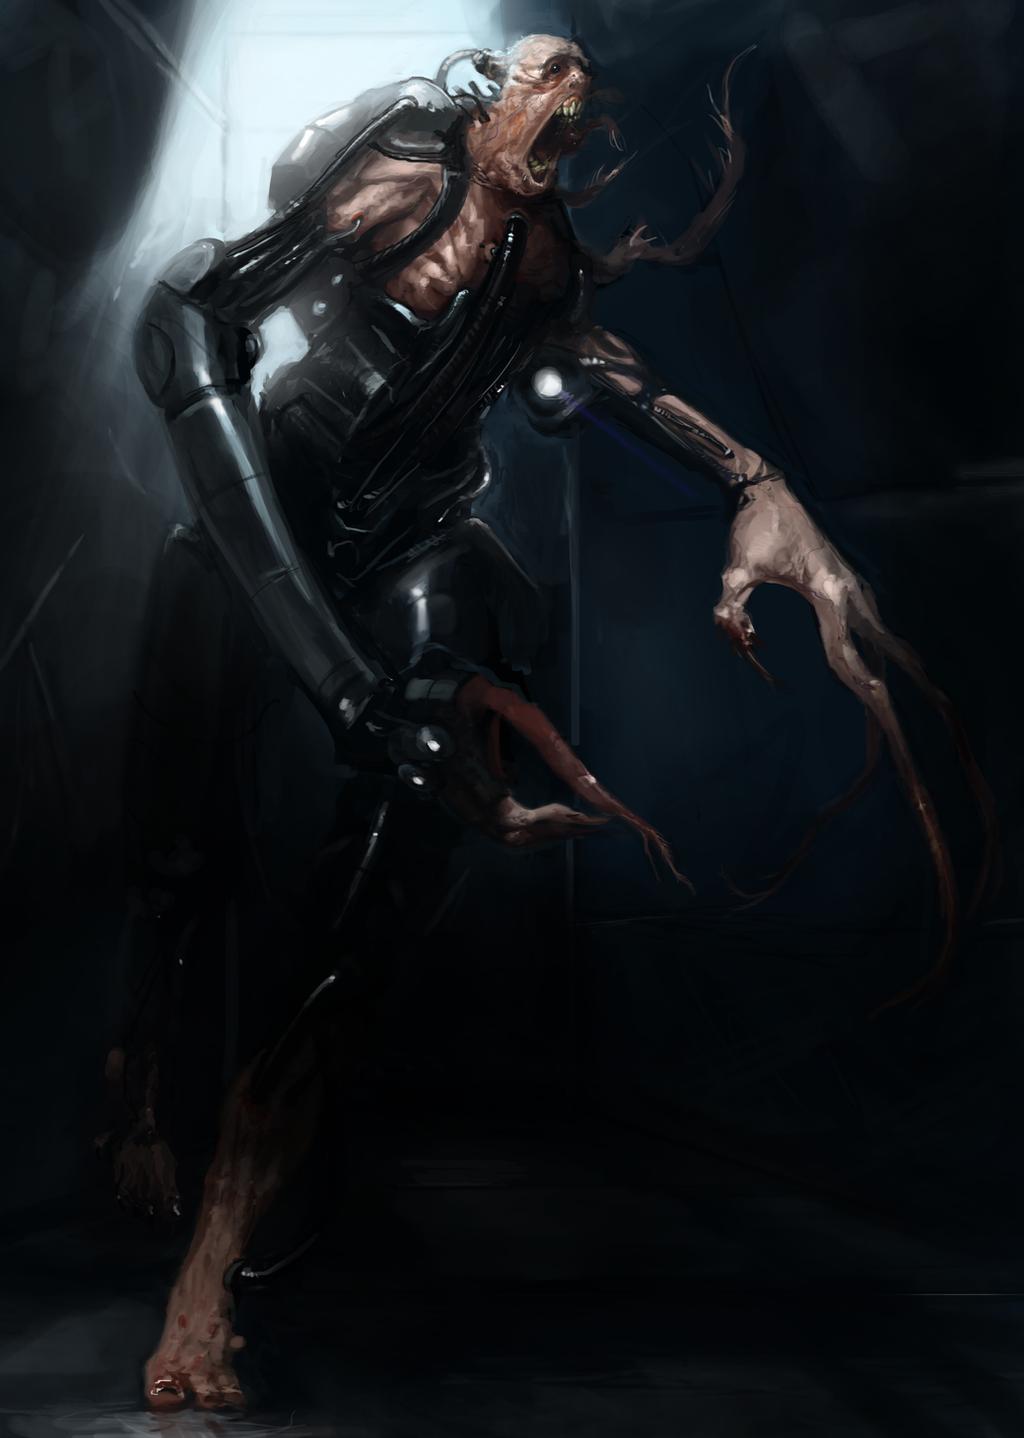 Sci-Fi Zombie by Erebus88